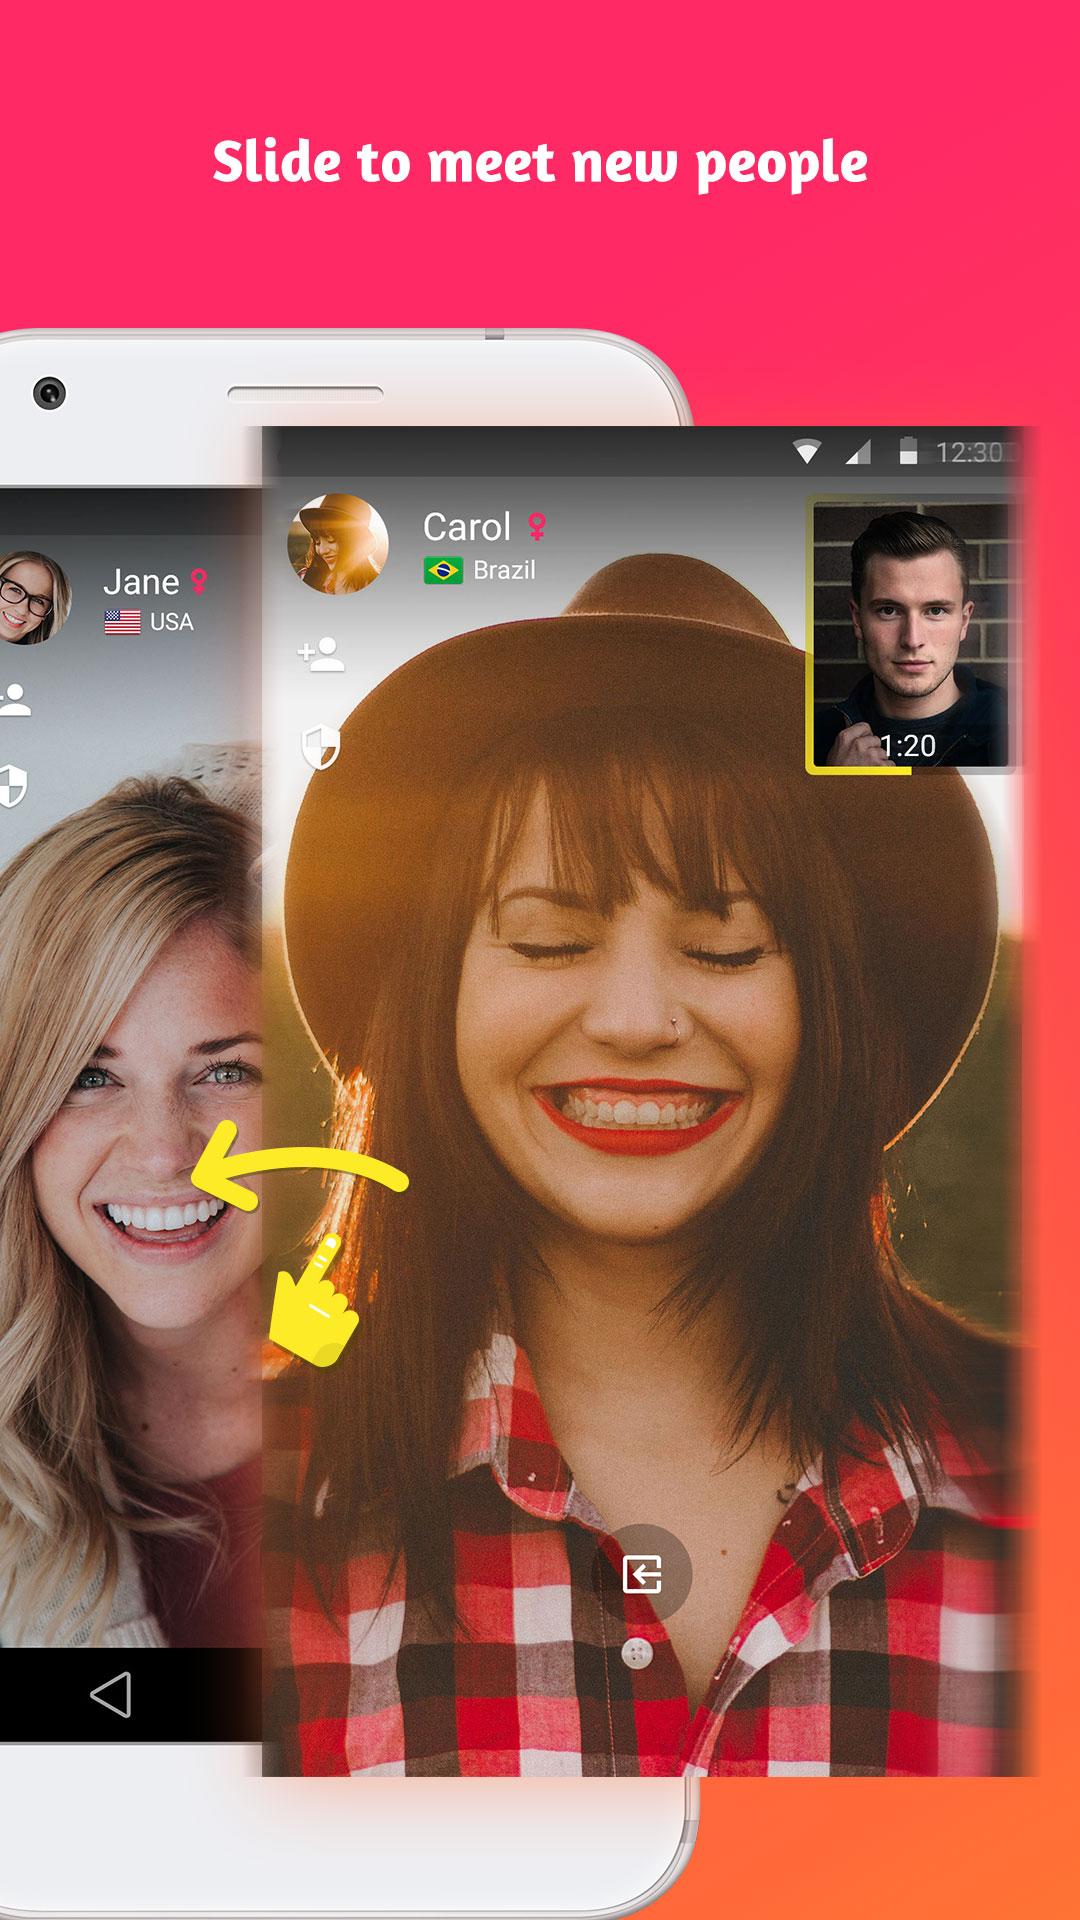 VivaChat - Meet new friends via random video chat: Amazon